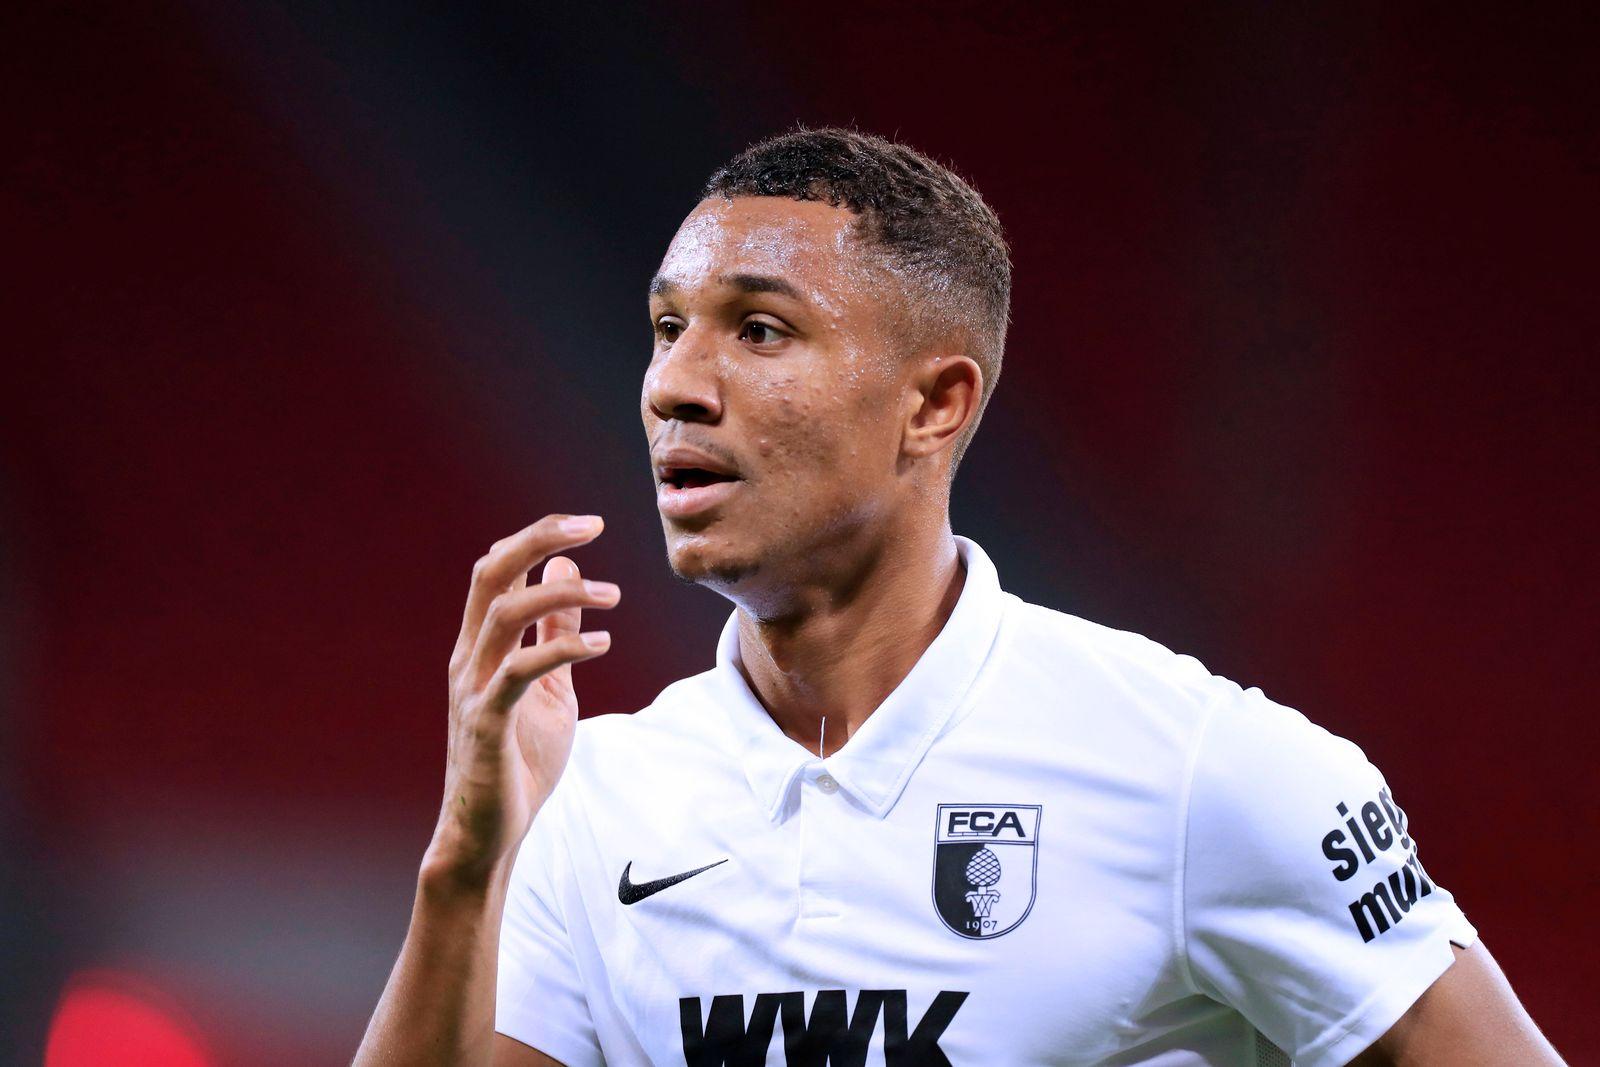 UDUOKHAI Felix Team FC Augsburg DFL Fussball Bundesliga Saison 2020-2021 Spiel Bayer 04 Leverkusen - FC Augsburg 3 : 1